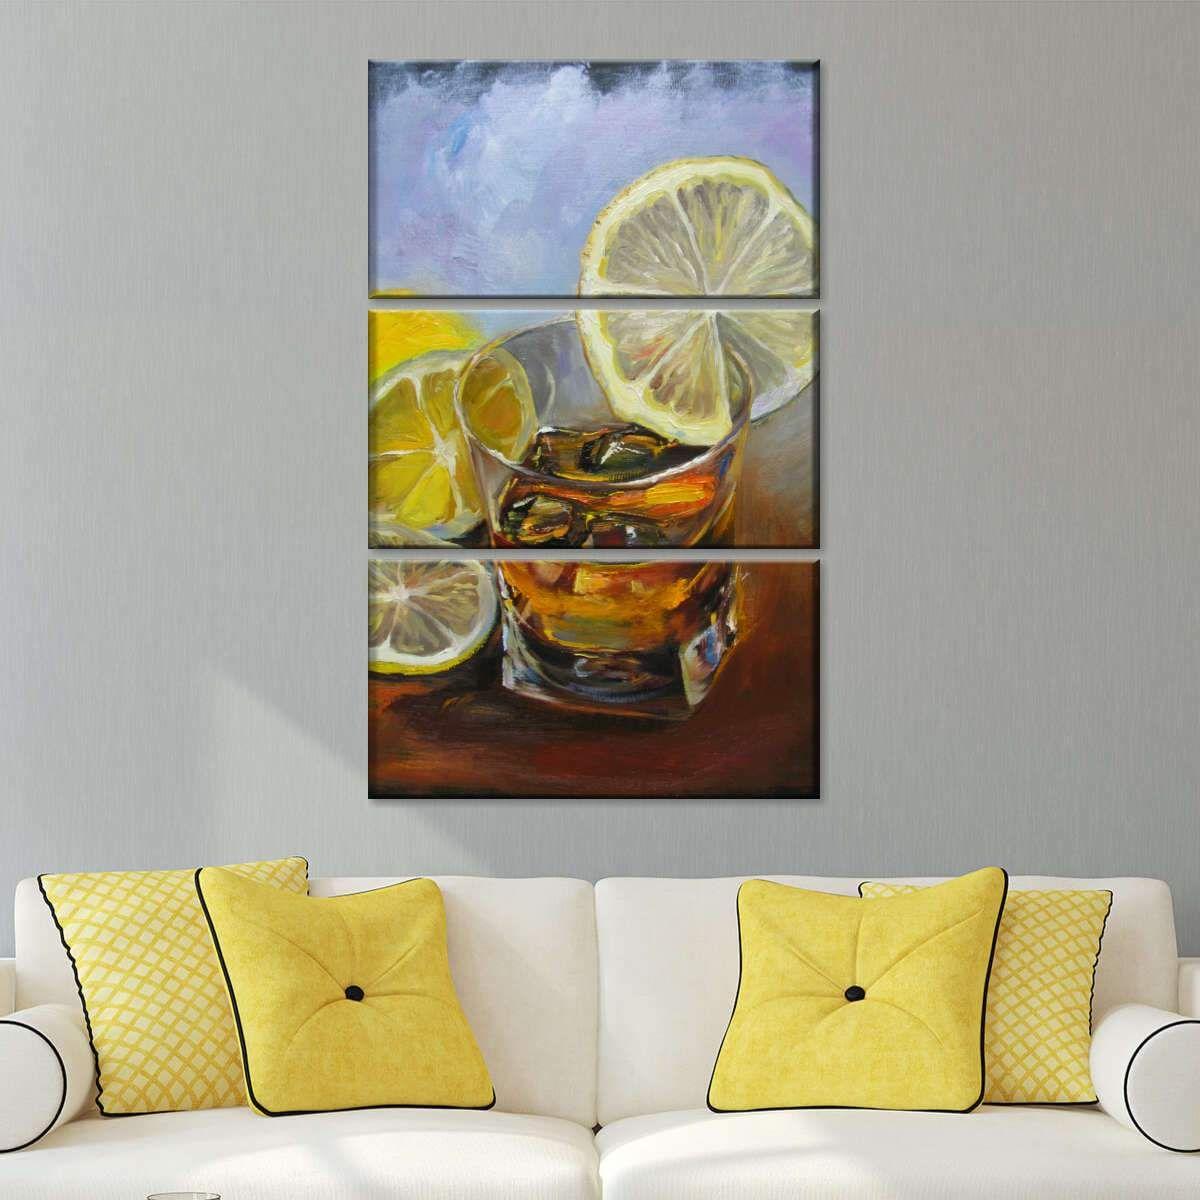 Whiskey With Lemon Wedge Multi Panel Canvas Wall Art In 2020 Multi Panel Canvas Canvas Wall Art Art